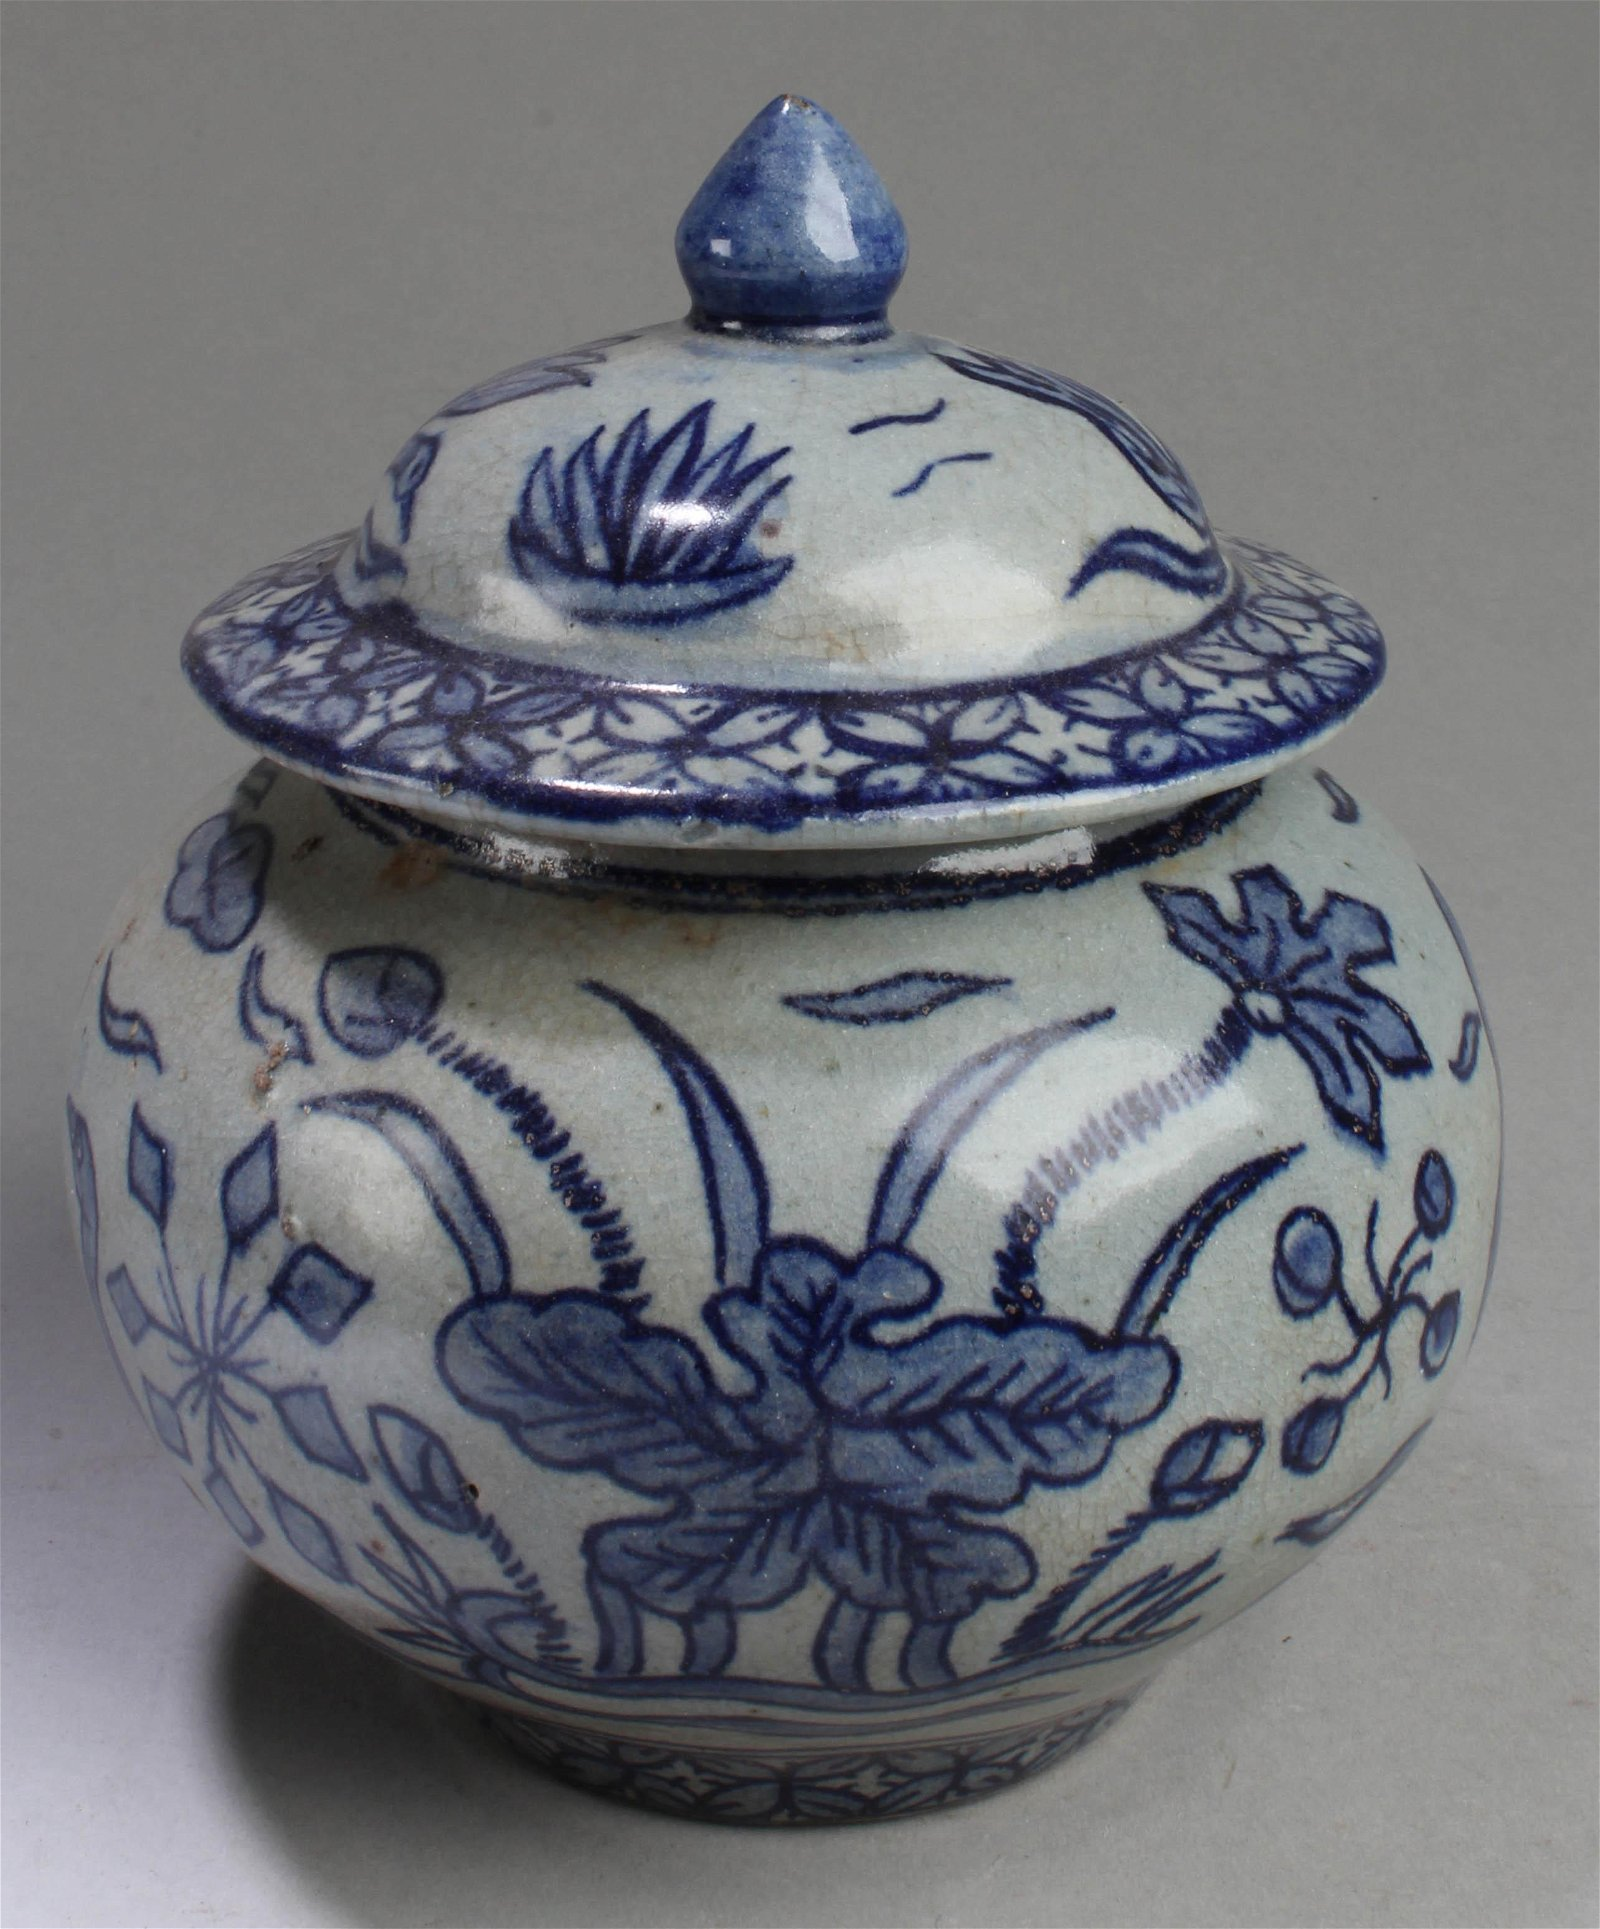 A Korean Blue & White Porcelain Jar with Lid